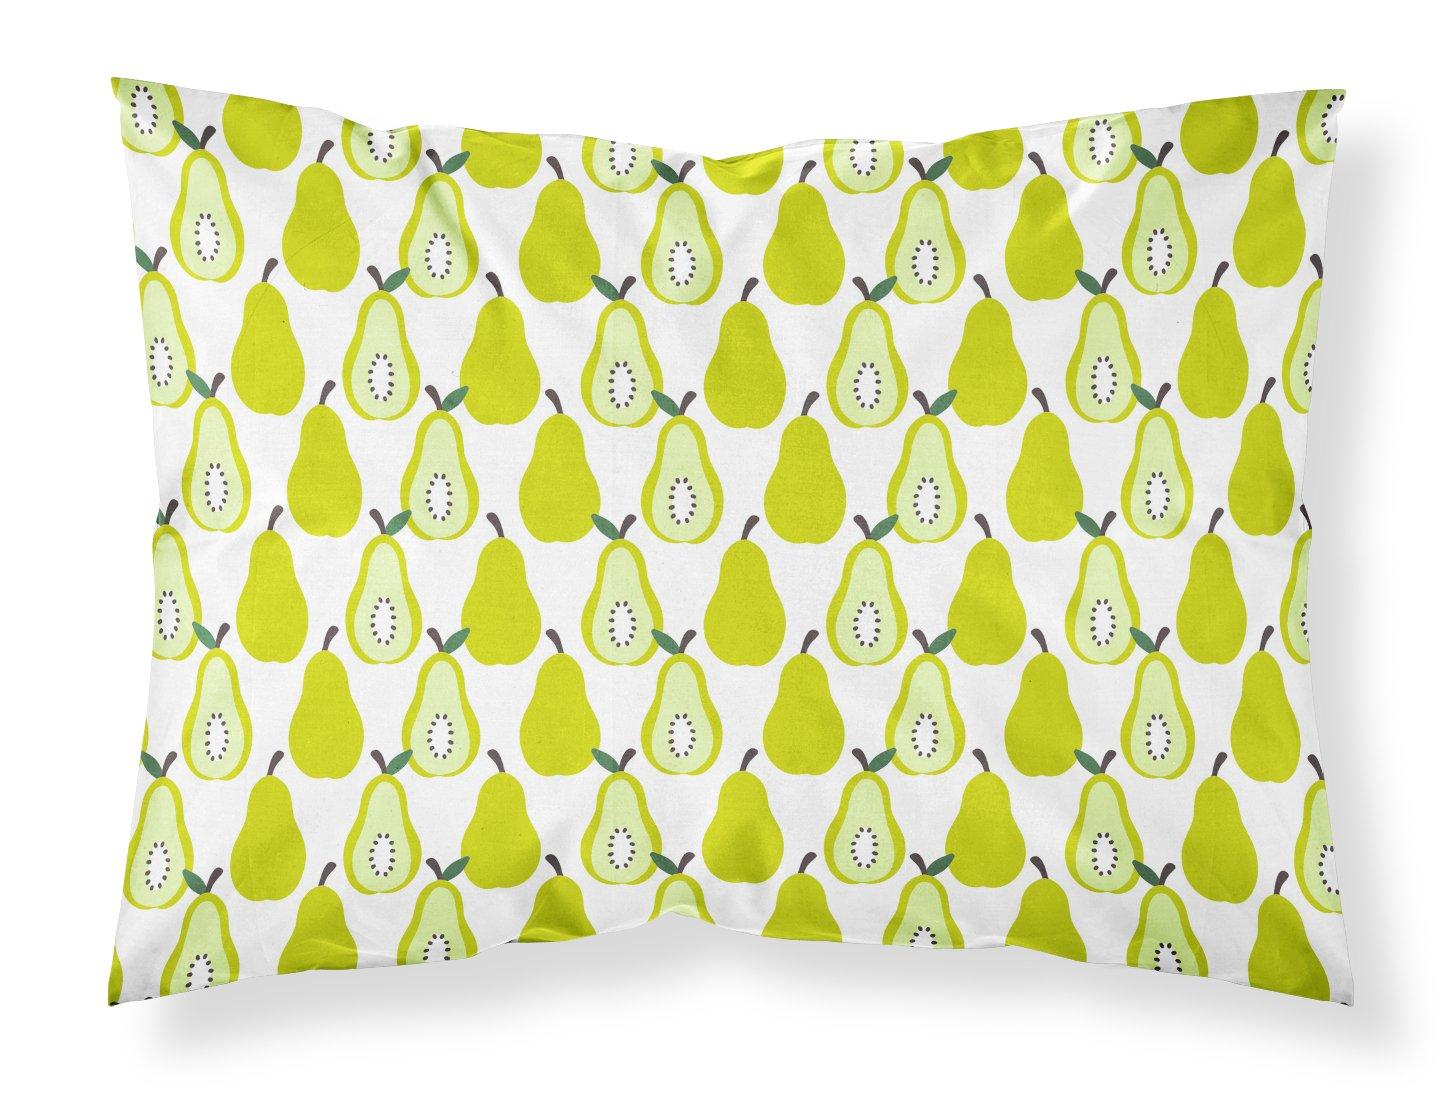 Carolines Treasures Watermelon on Lime Green Pillowcase Standard Multicolor